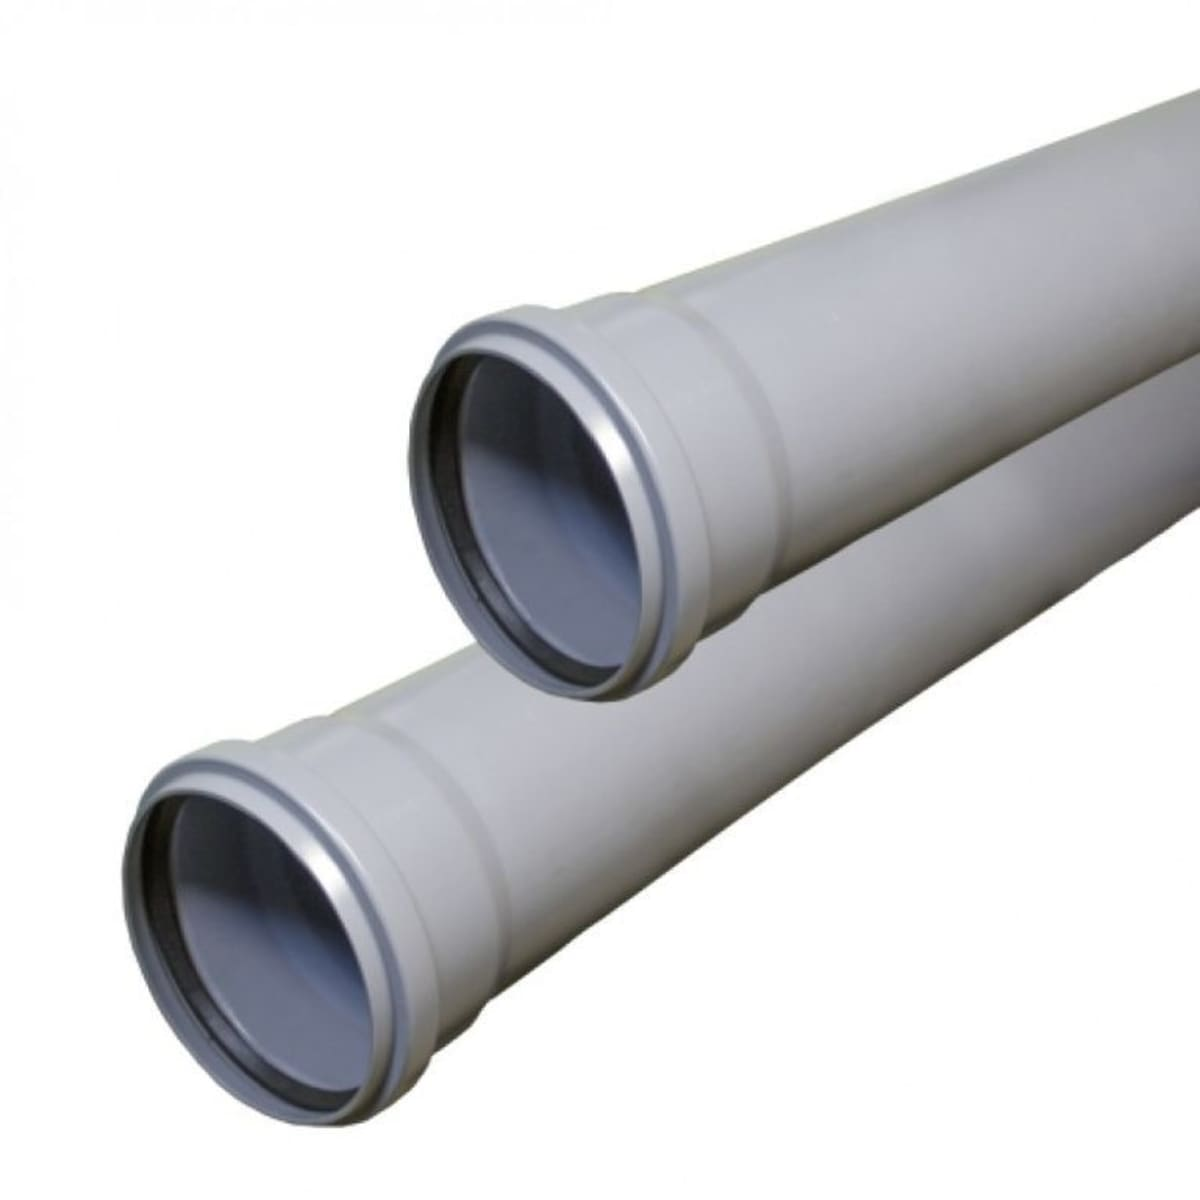 Труба пнд для канализации: характеристики, виды, установка